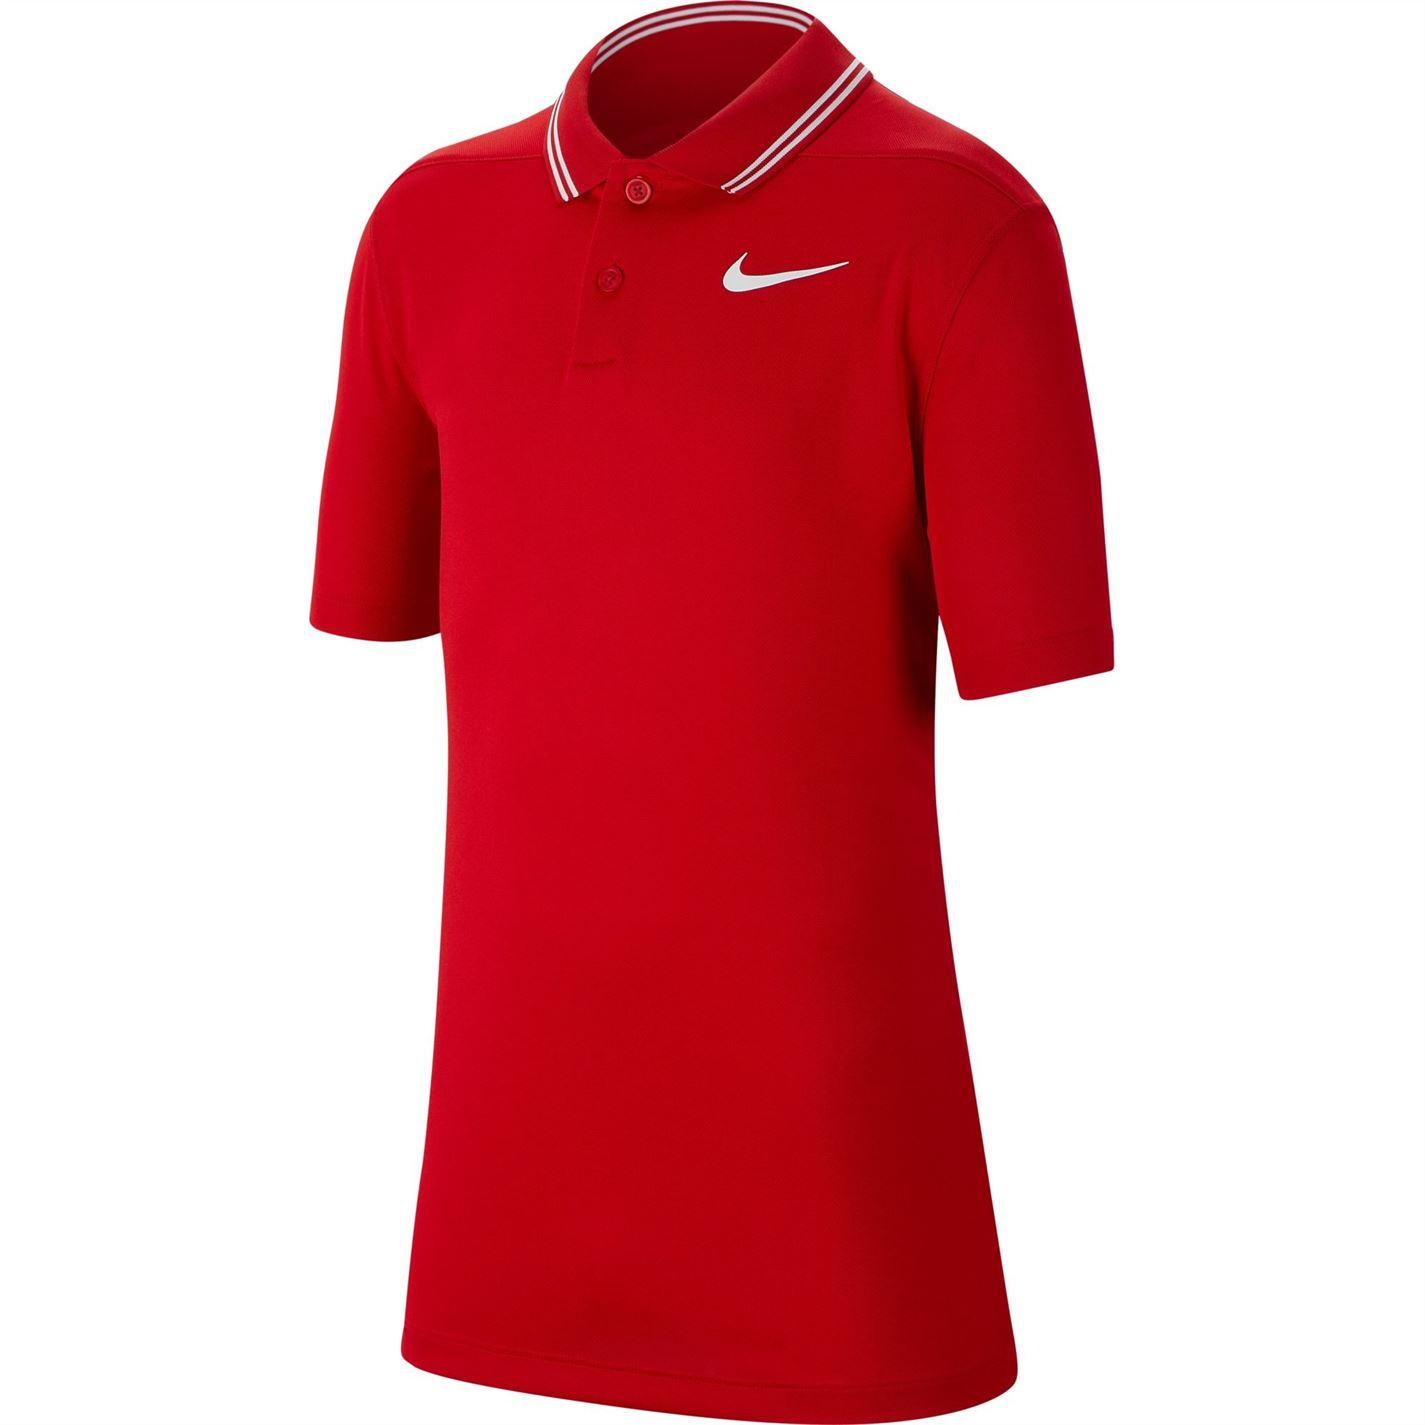 Tricouri polo pentru golf Nike Dri-FIT Victory pentru baieti rosu